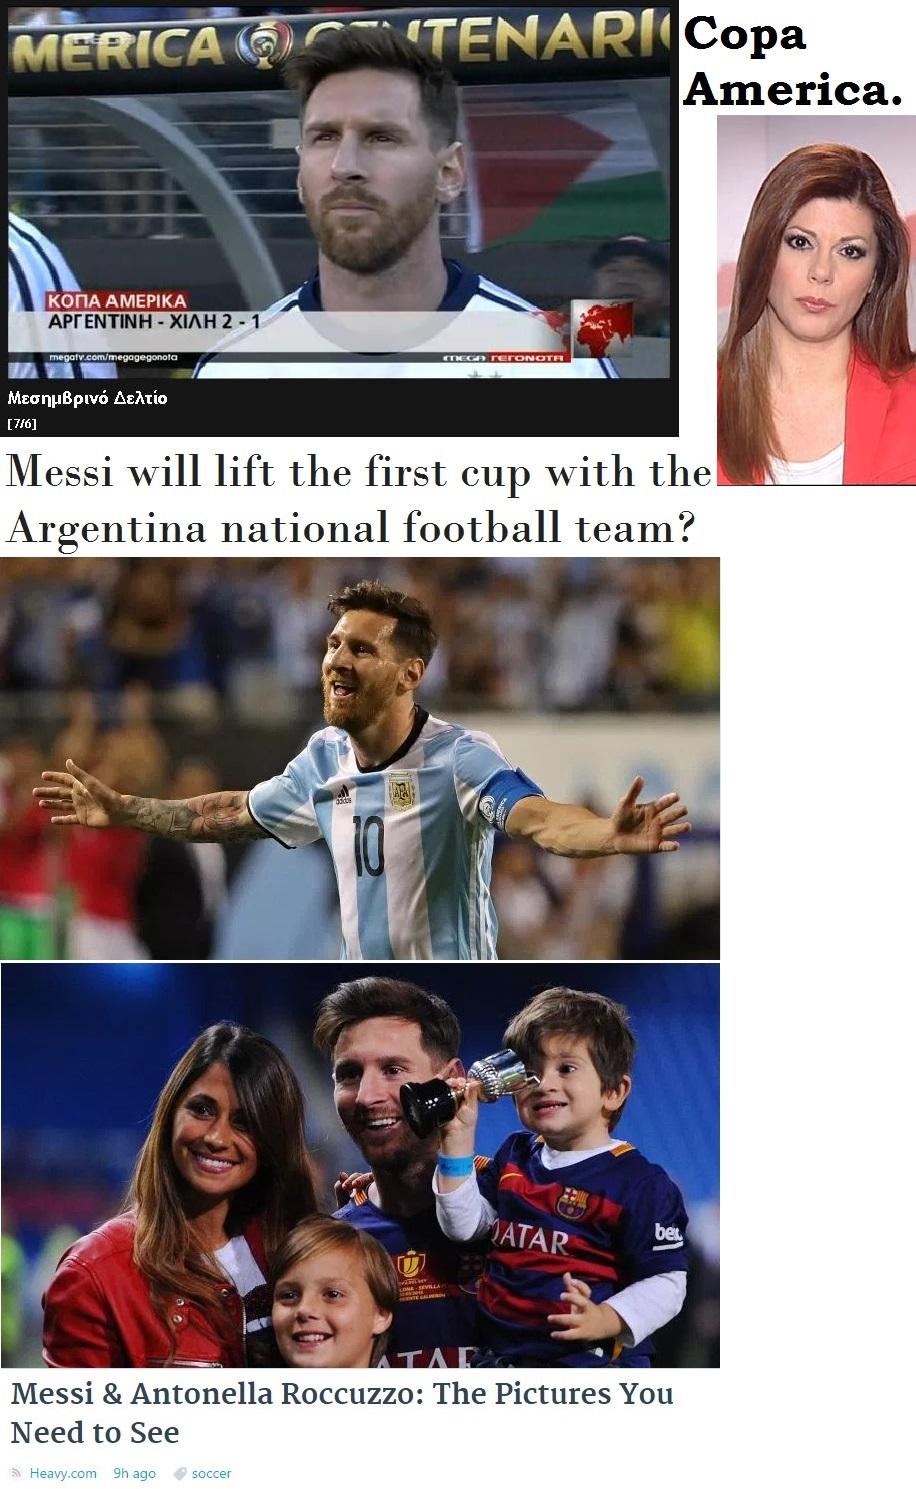 FOOTBALL COPA AMERICA ARGENTINA MESSI FINAL 01 230616